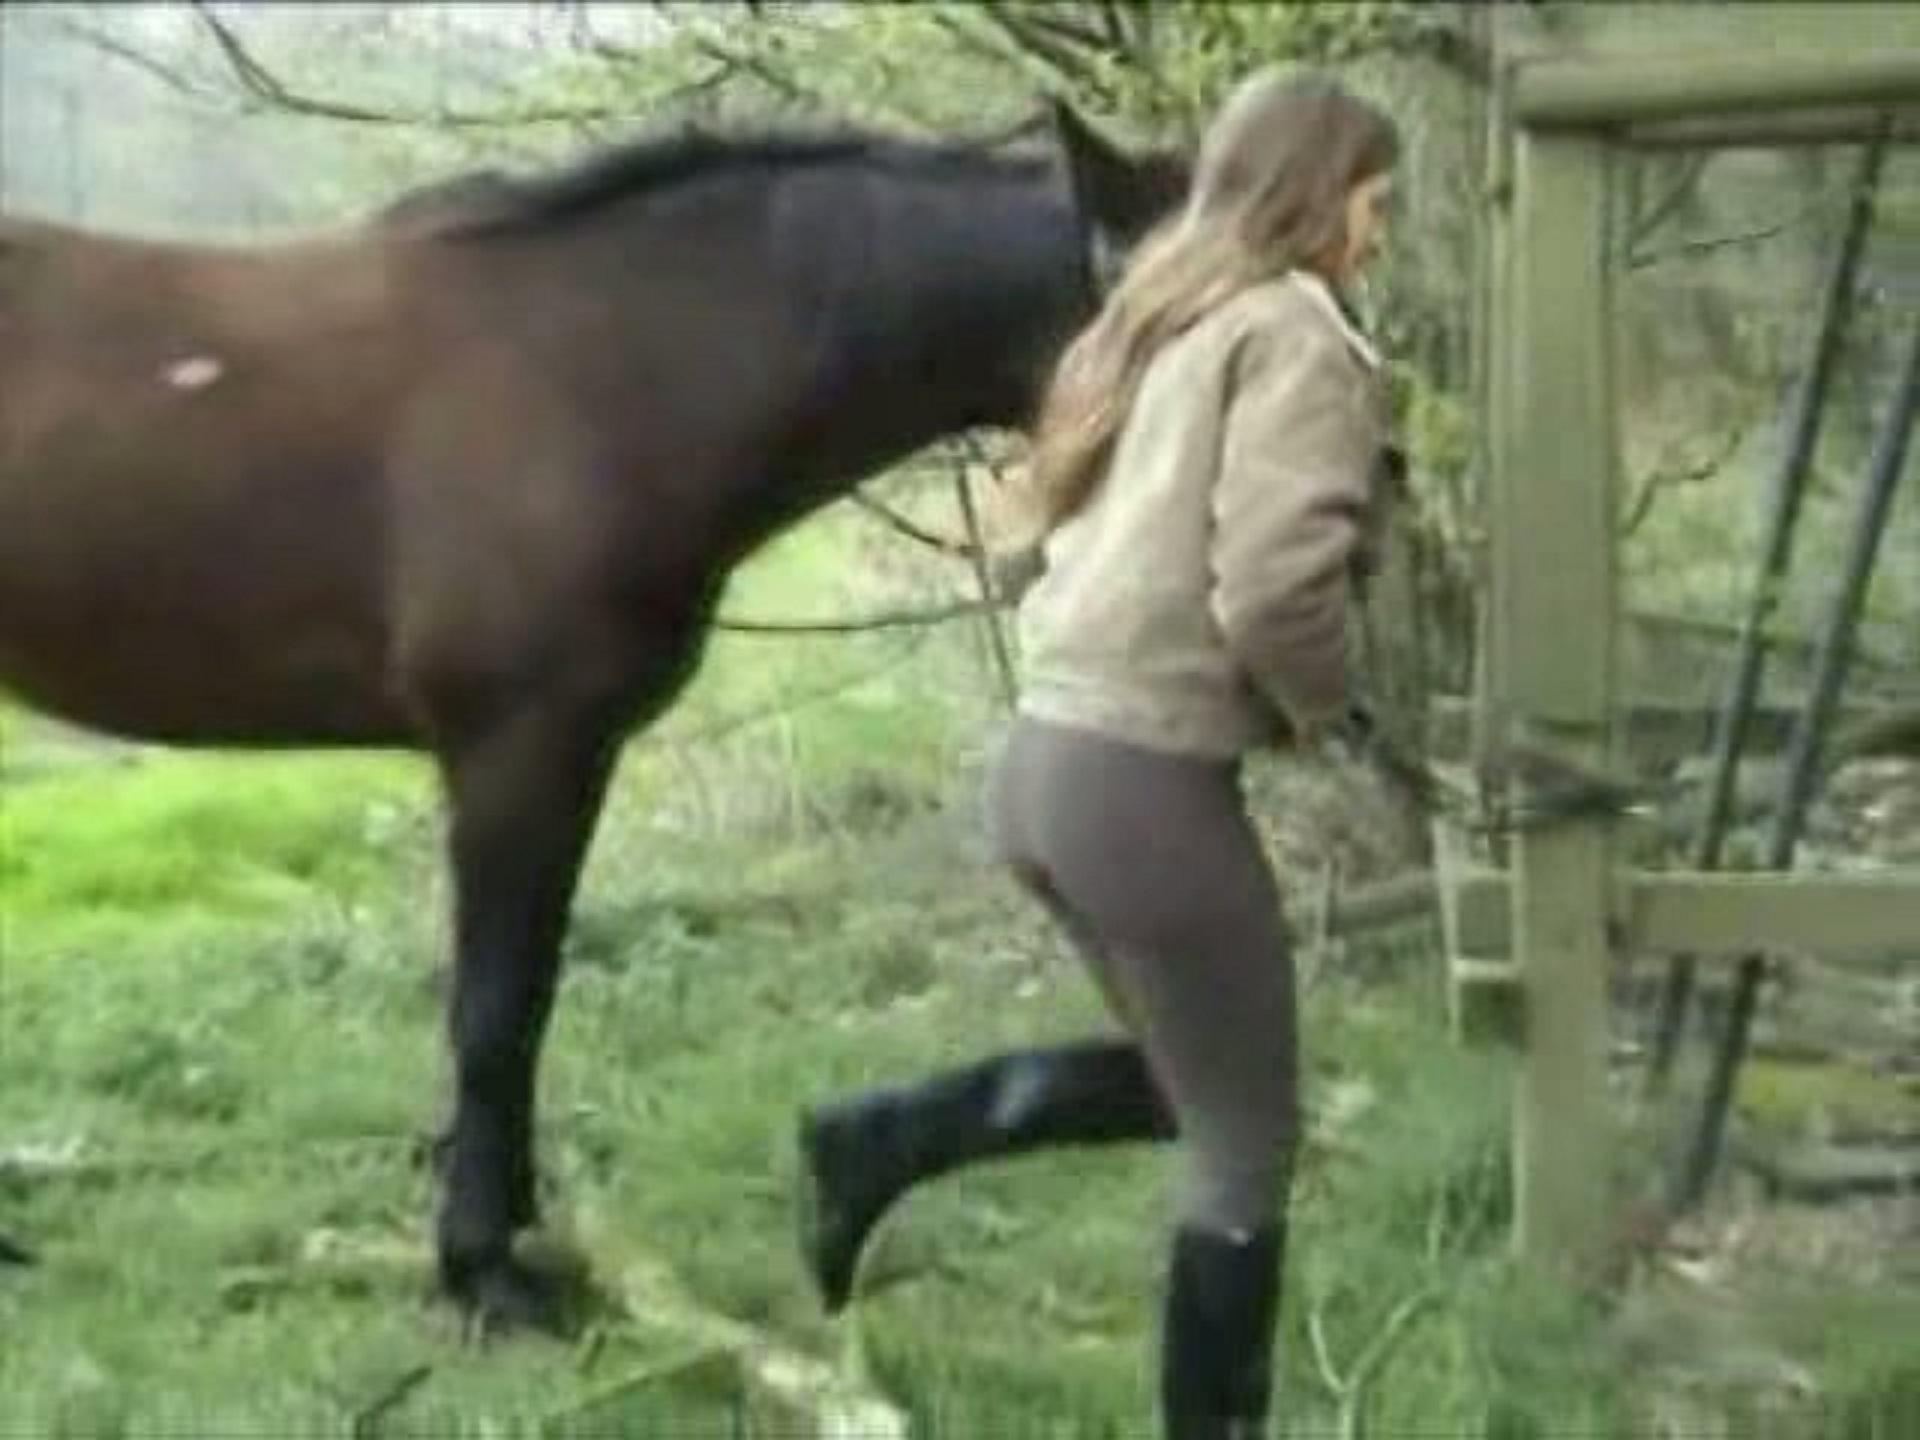 Cute zoofilia horse asshole story